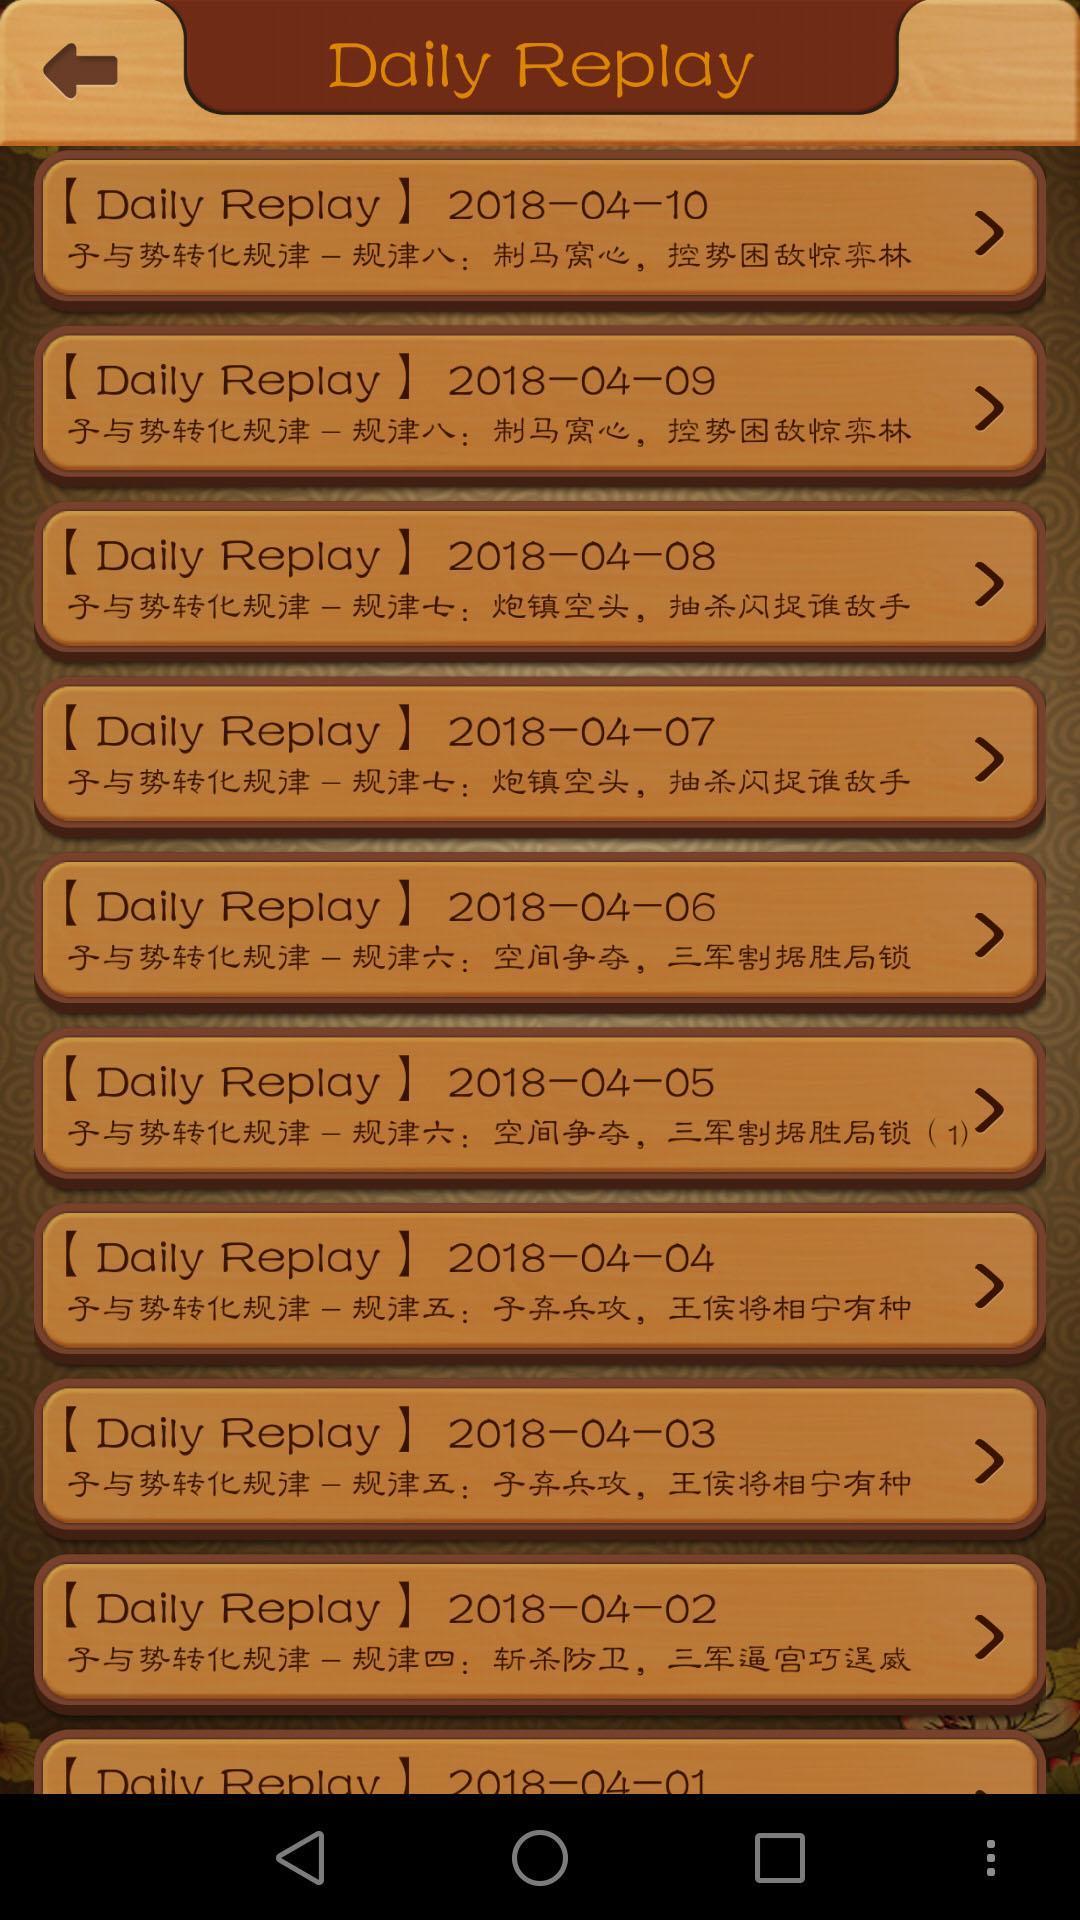 Chinese Chess, Xiangqi - many endgame and replay 3.9.6 Screenshot 4